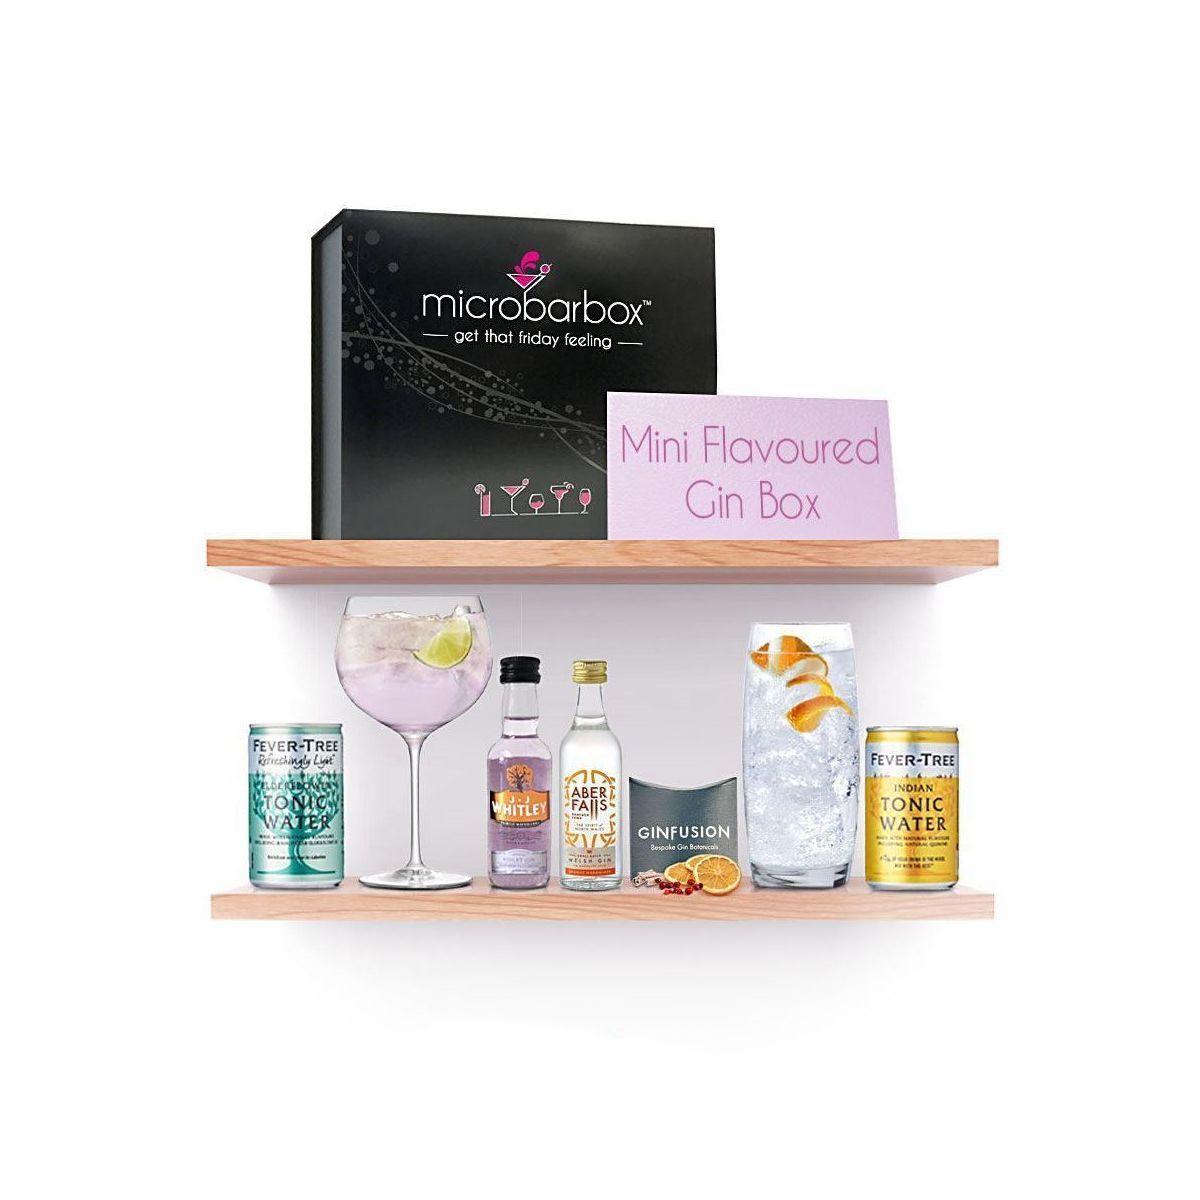 Microbarbox Mini Flavoured Gin Box